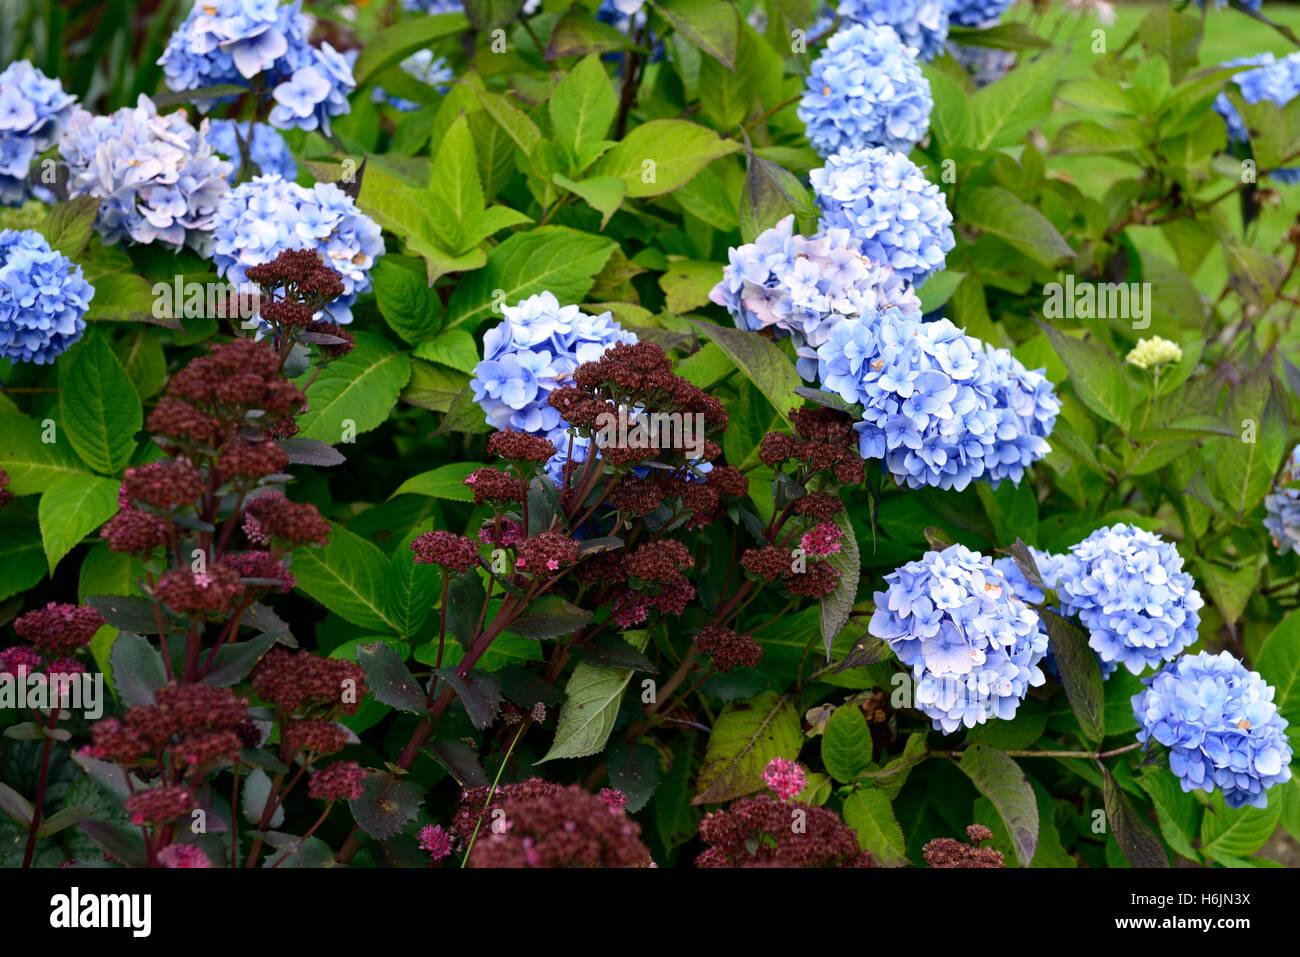 Sedum telephium jennifer blue mophead hydrangea purple flower sedum telephium jennifer blue mophead hydrangea purple flower flowers flowering combination garden gardens rm floral altavistaventures Image collections